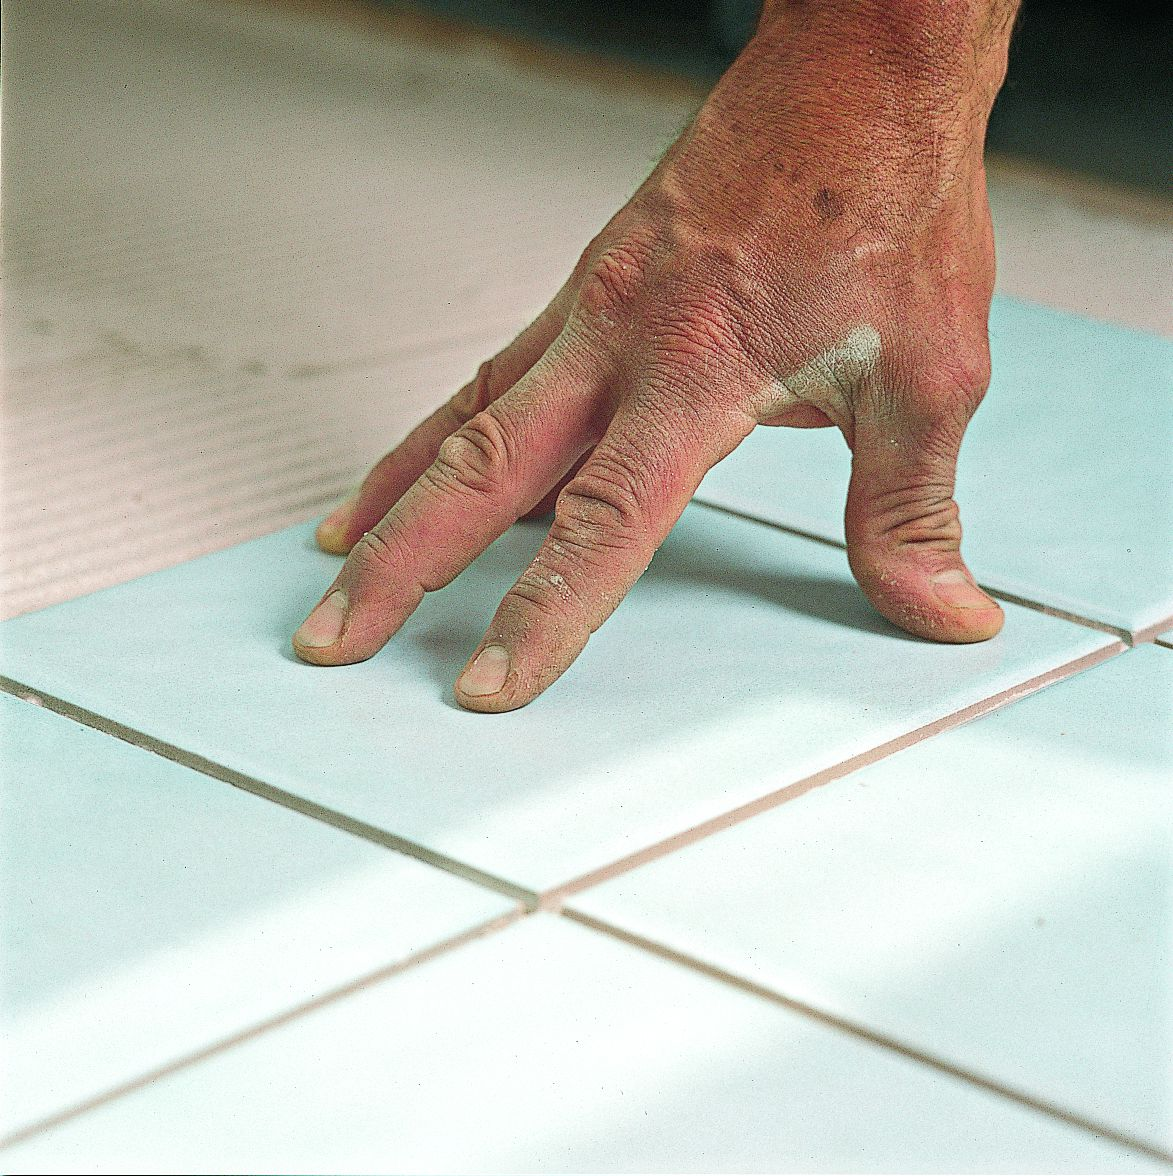 Setting Bathroom Tile On Thinset Mortar